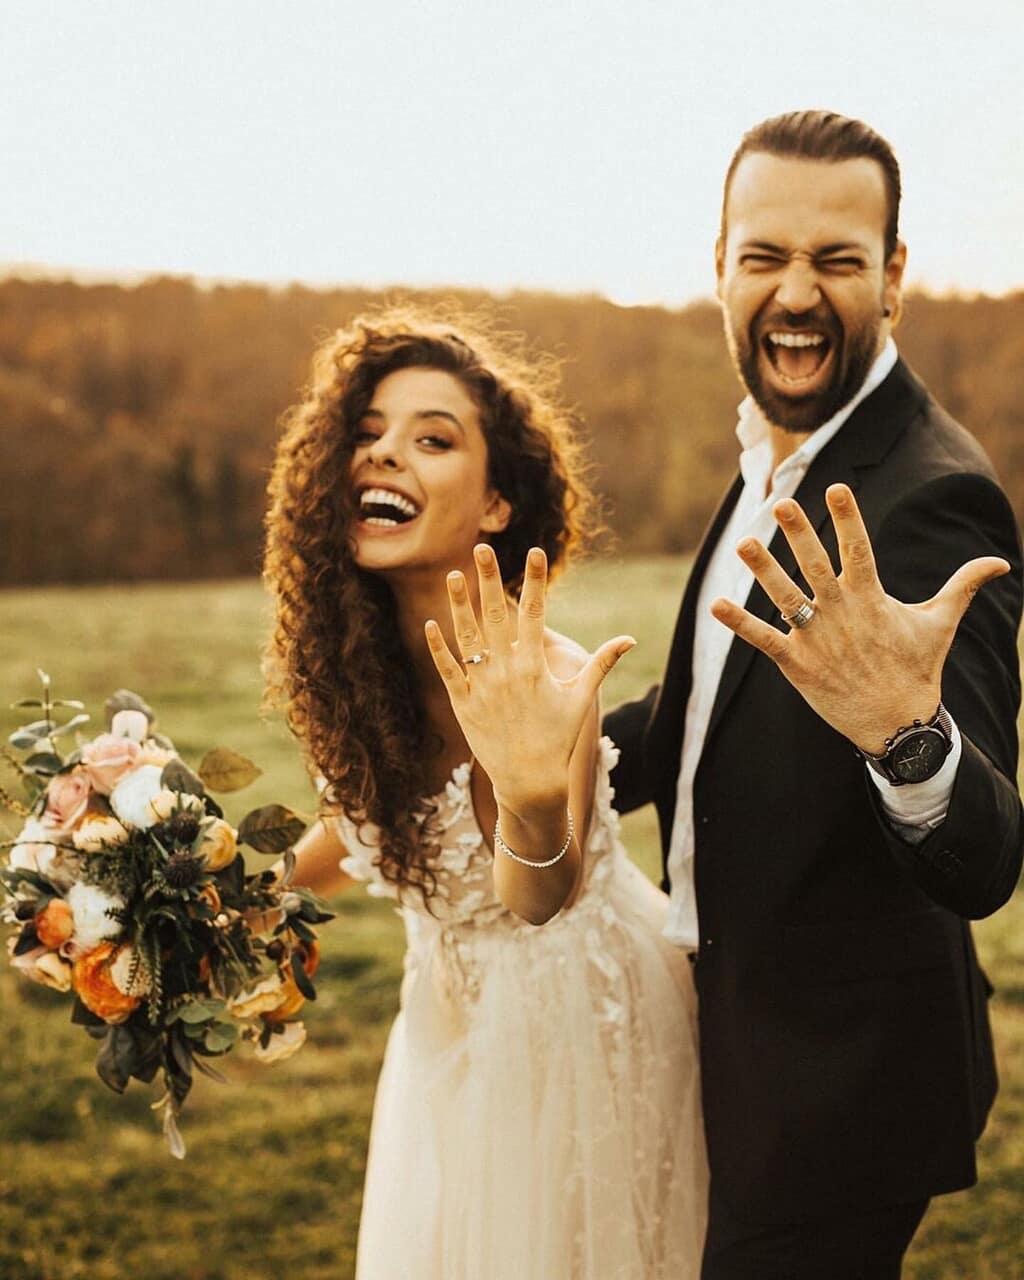 bride, wedding dress, and wedding photo image